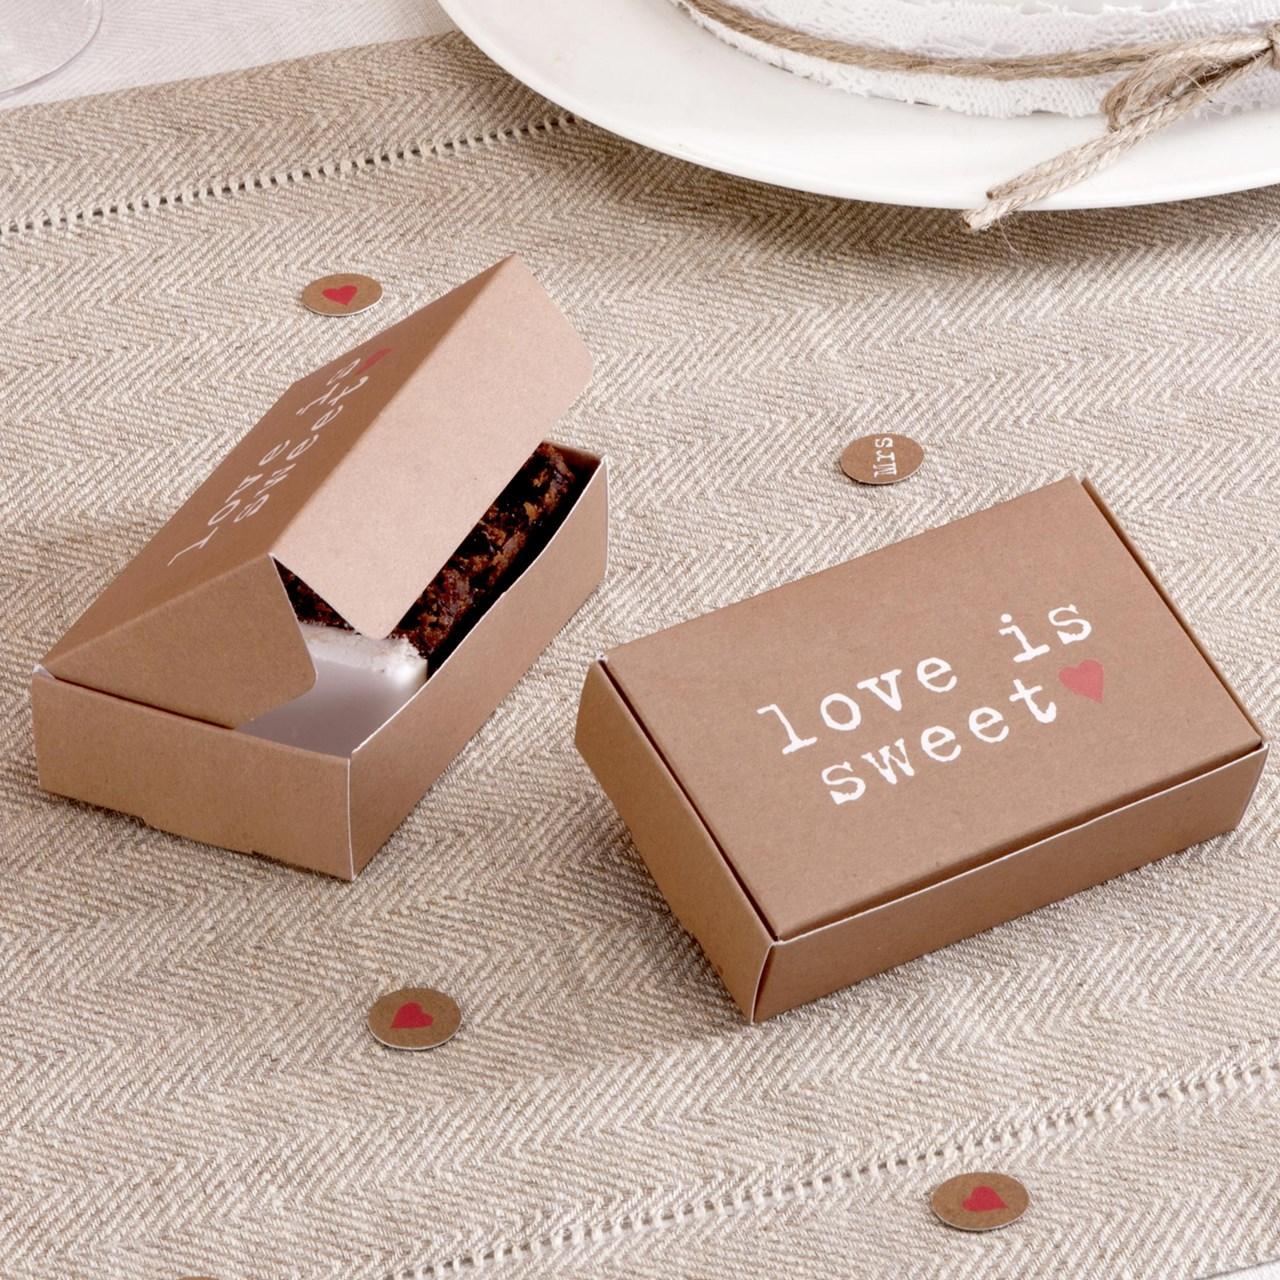 Just My Type Cake Box Uk Wedding Favours